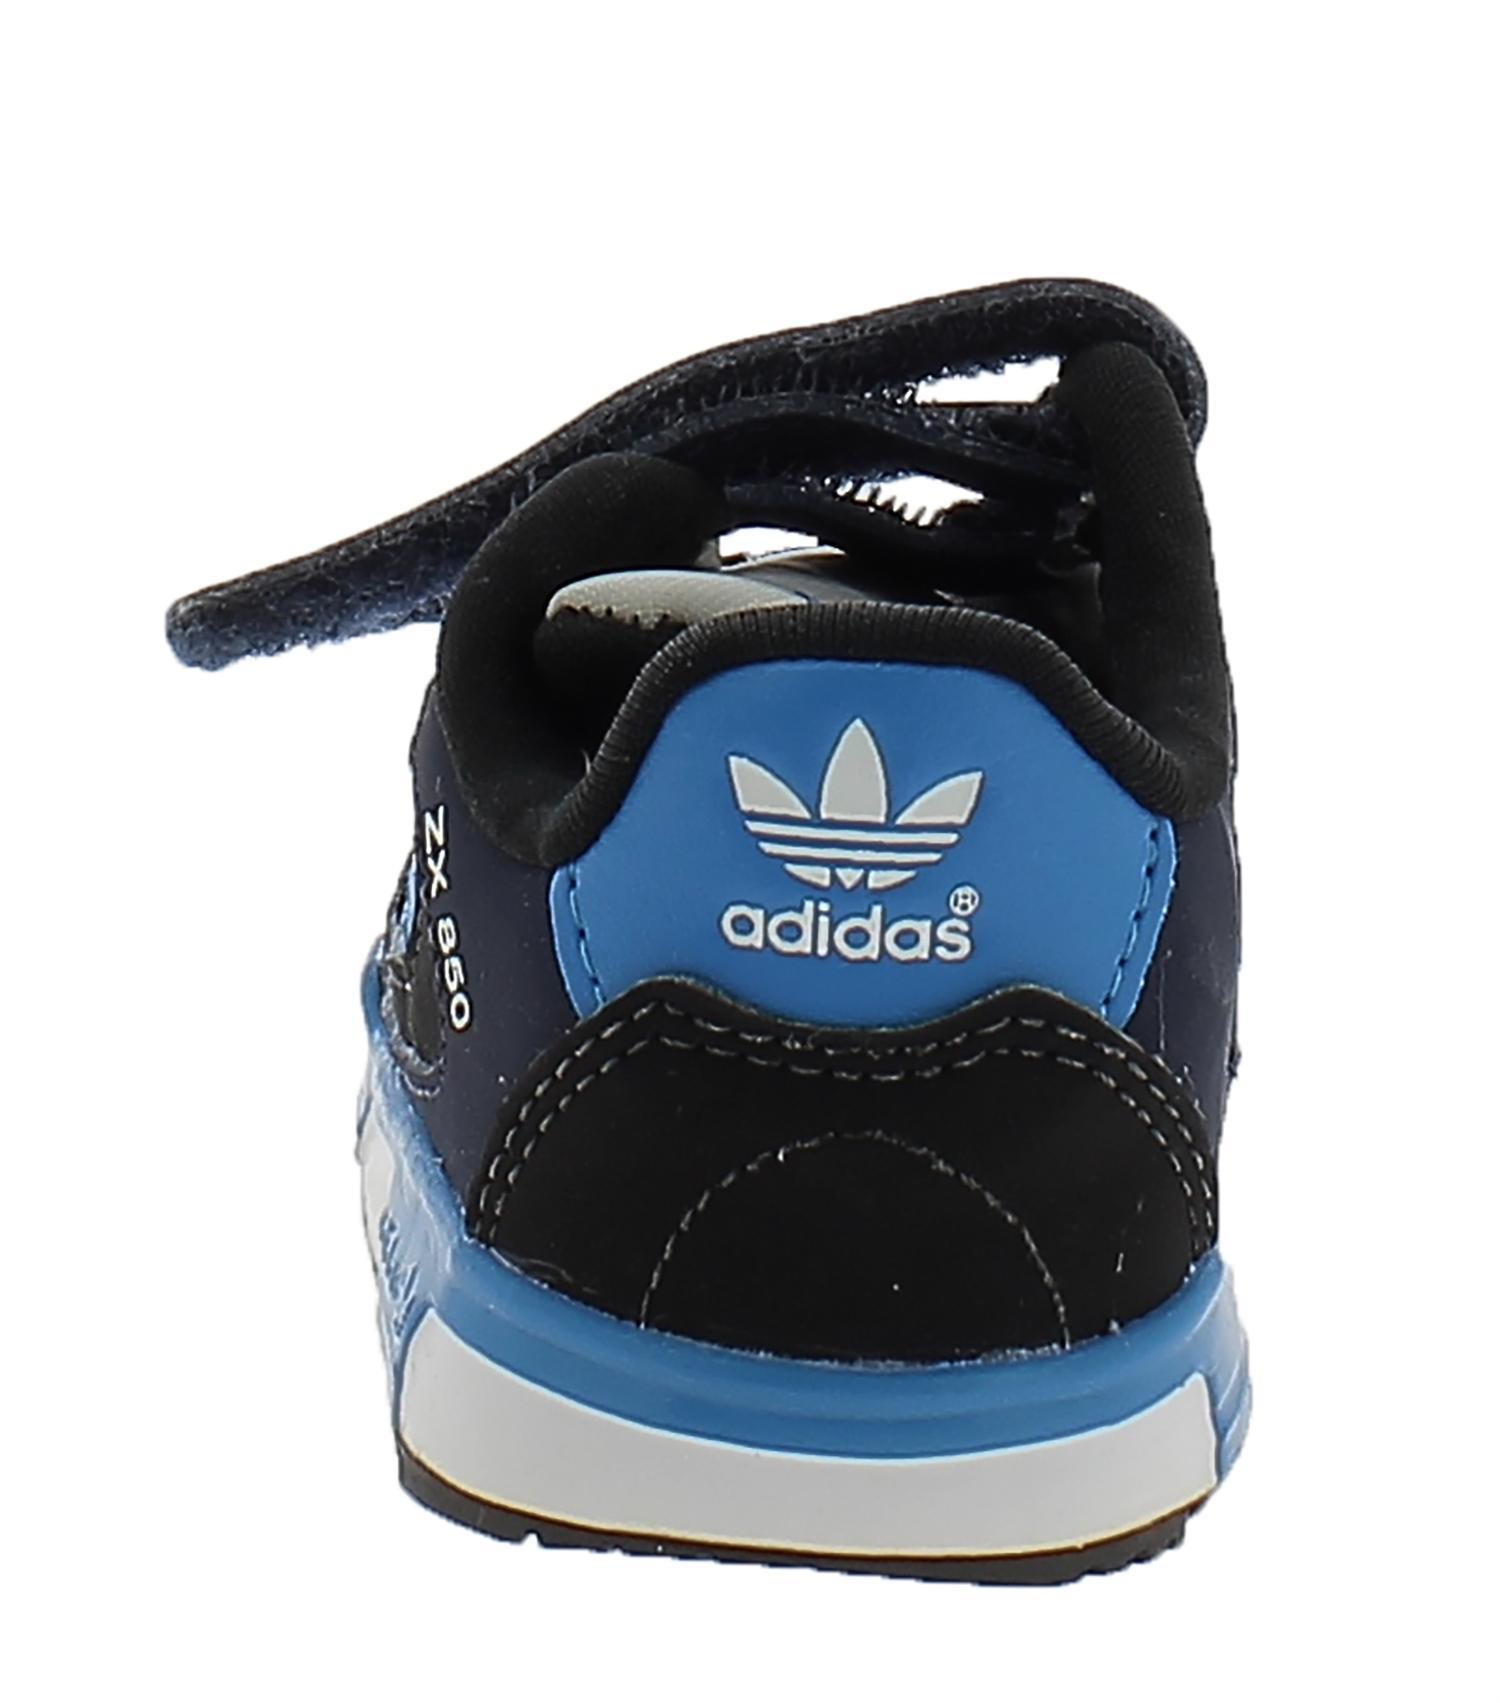 adidas adidas zx 850 cf i  scarpe bambino blu pelle tela strappi m19746